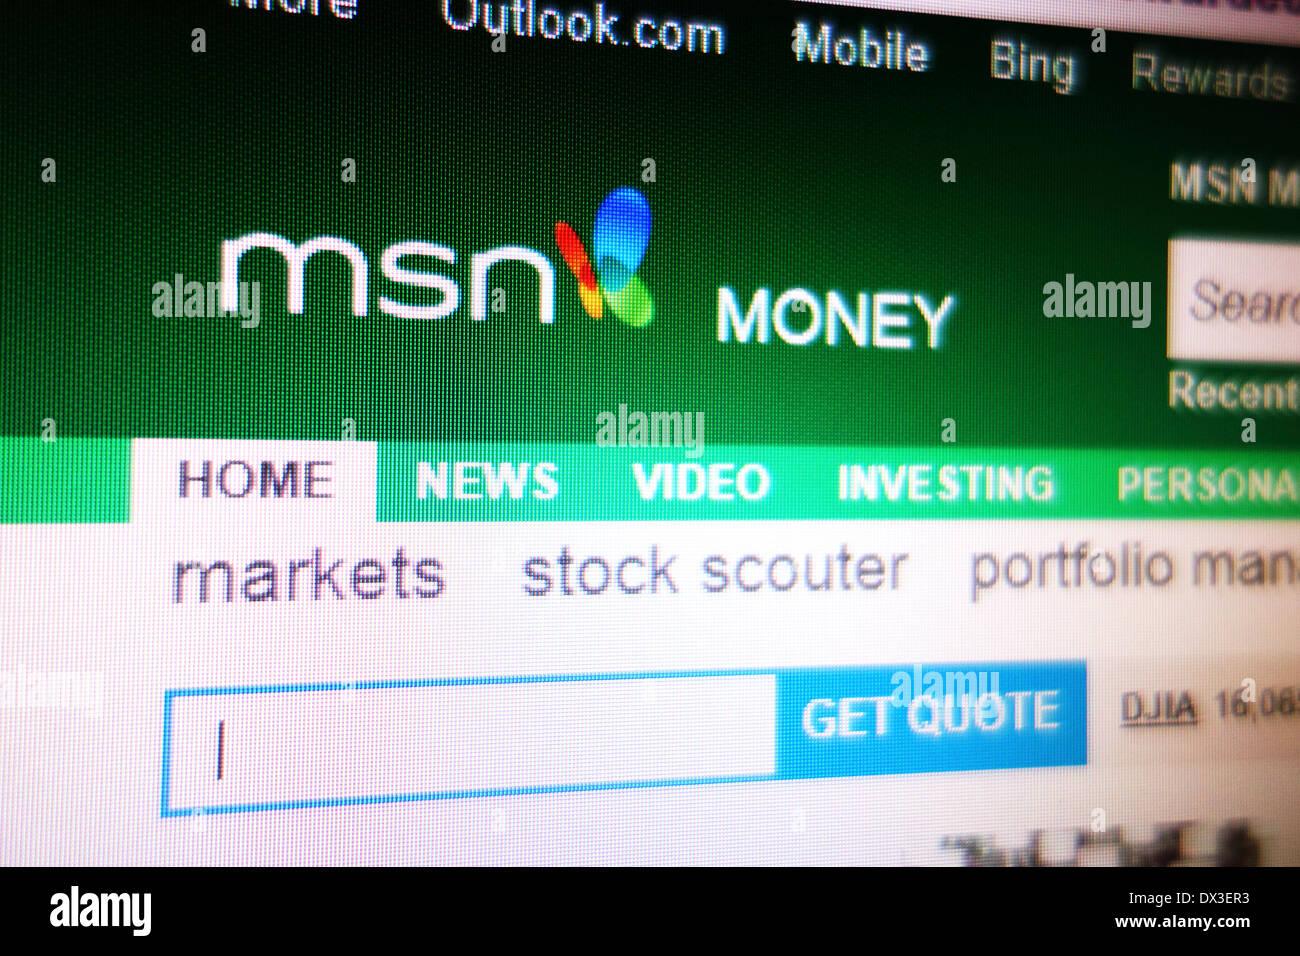 Msn Money Stock Quotes Msn Money Website Stock Photo Royalty Free Image 67689639  Alamy